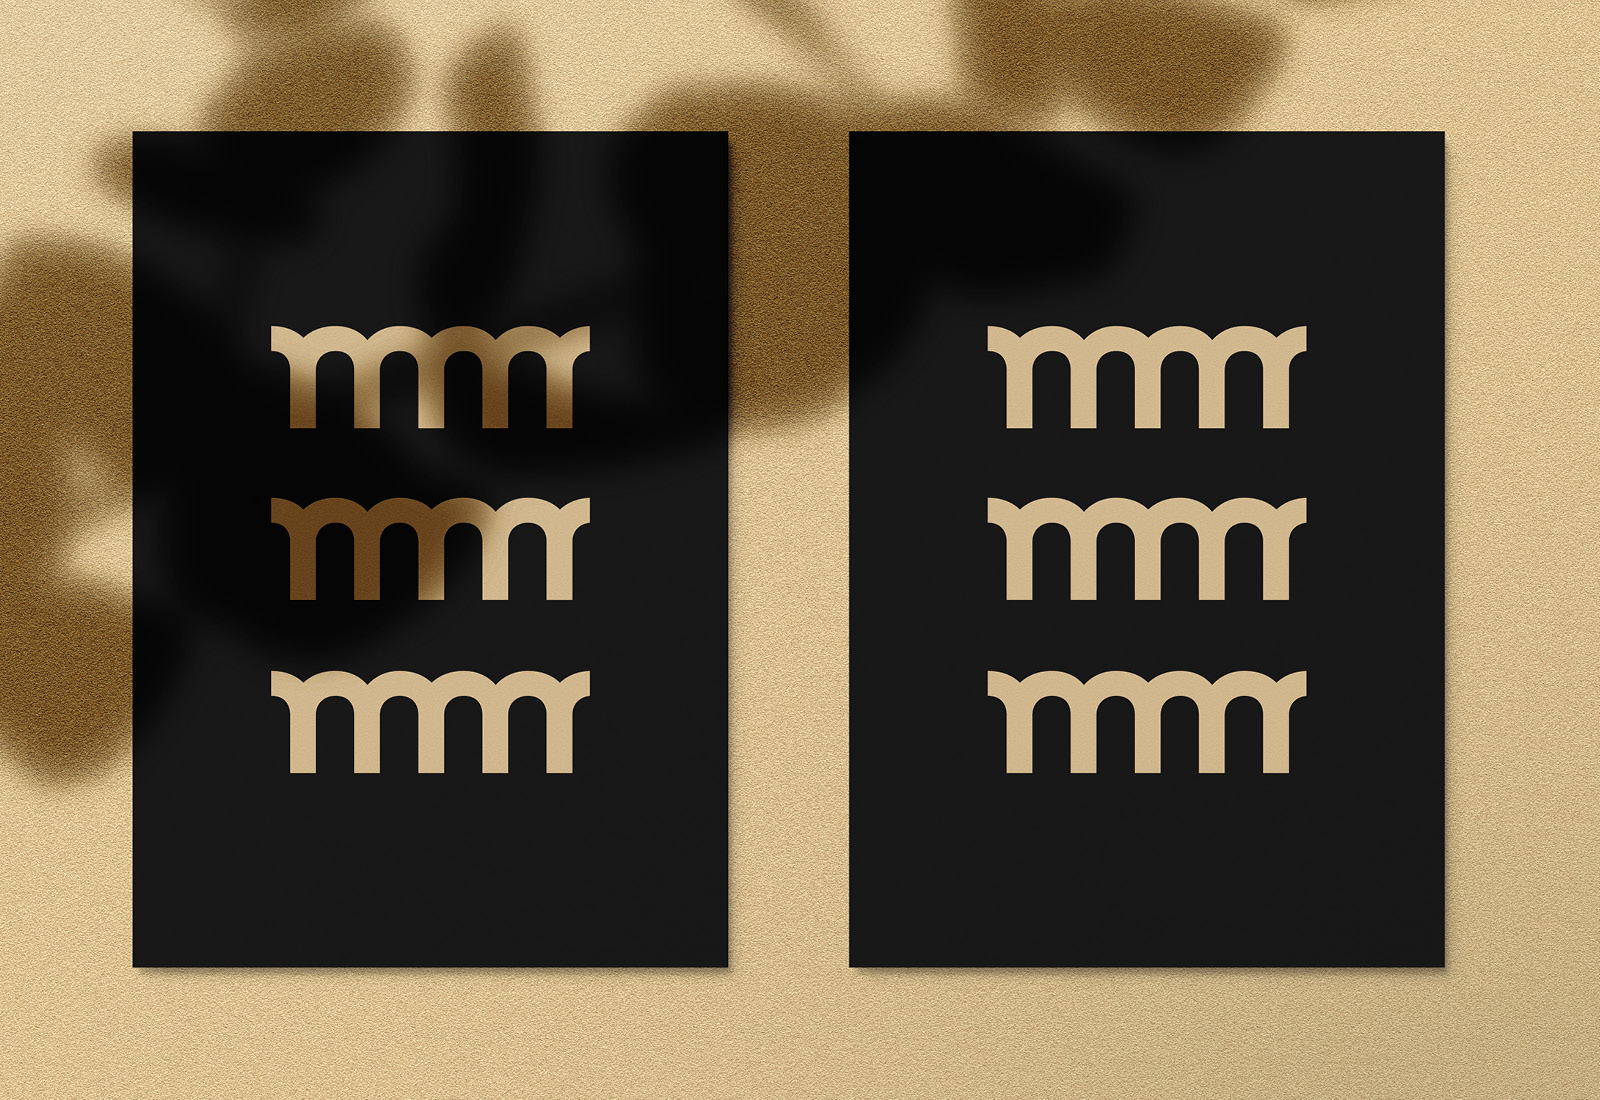 josselin-tourette-remiremont-branding-3